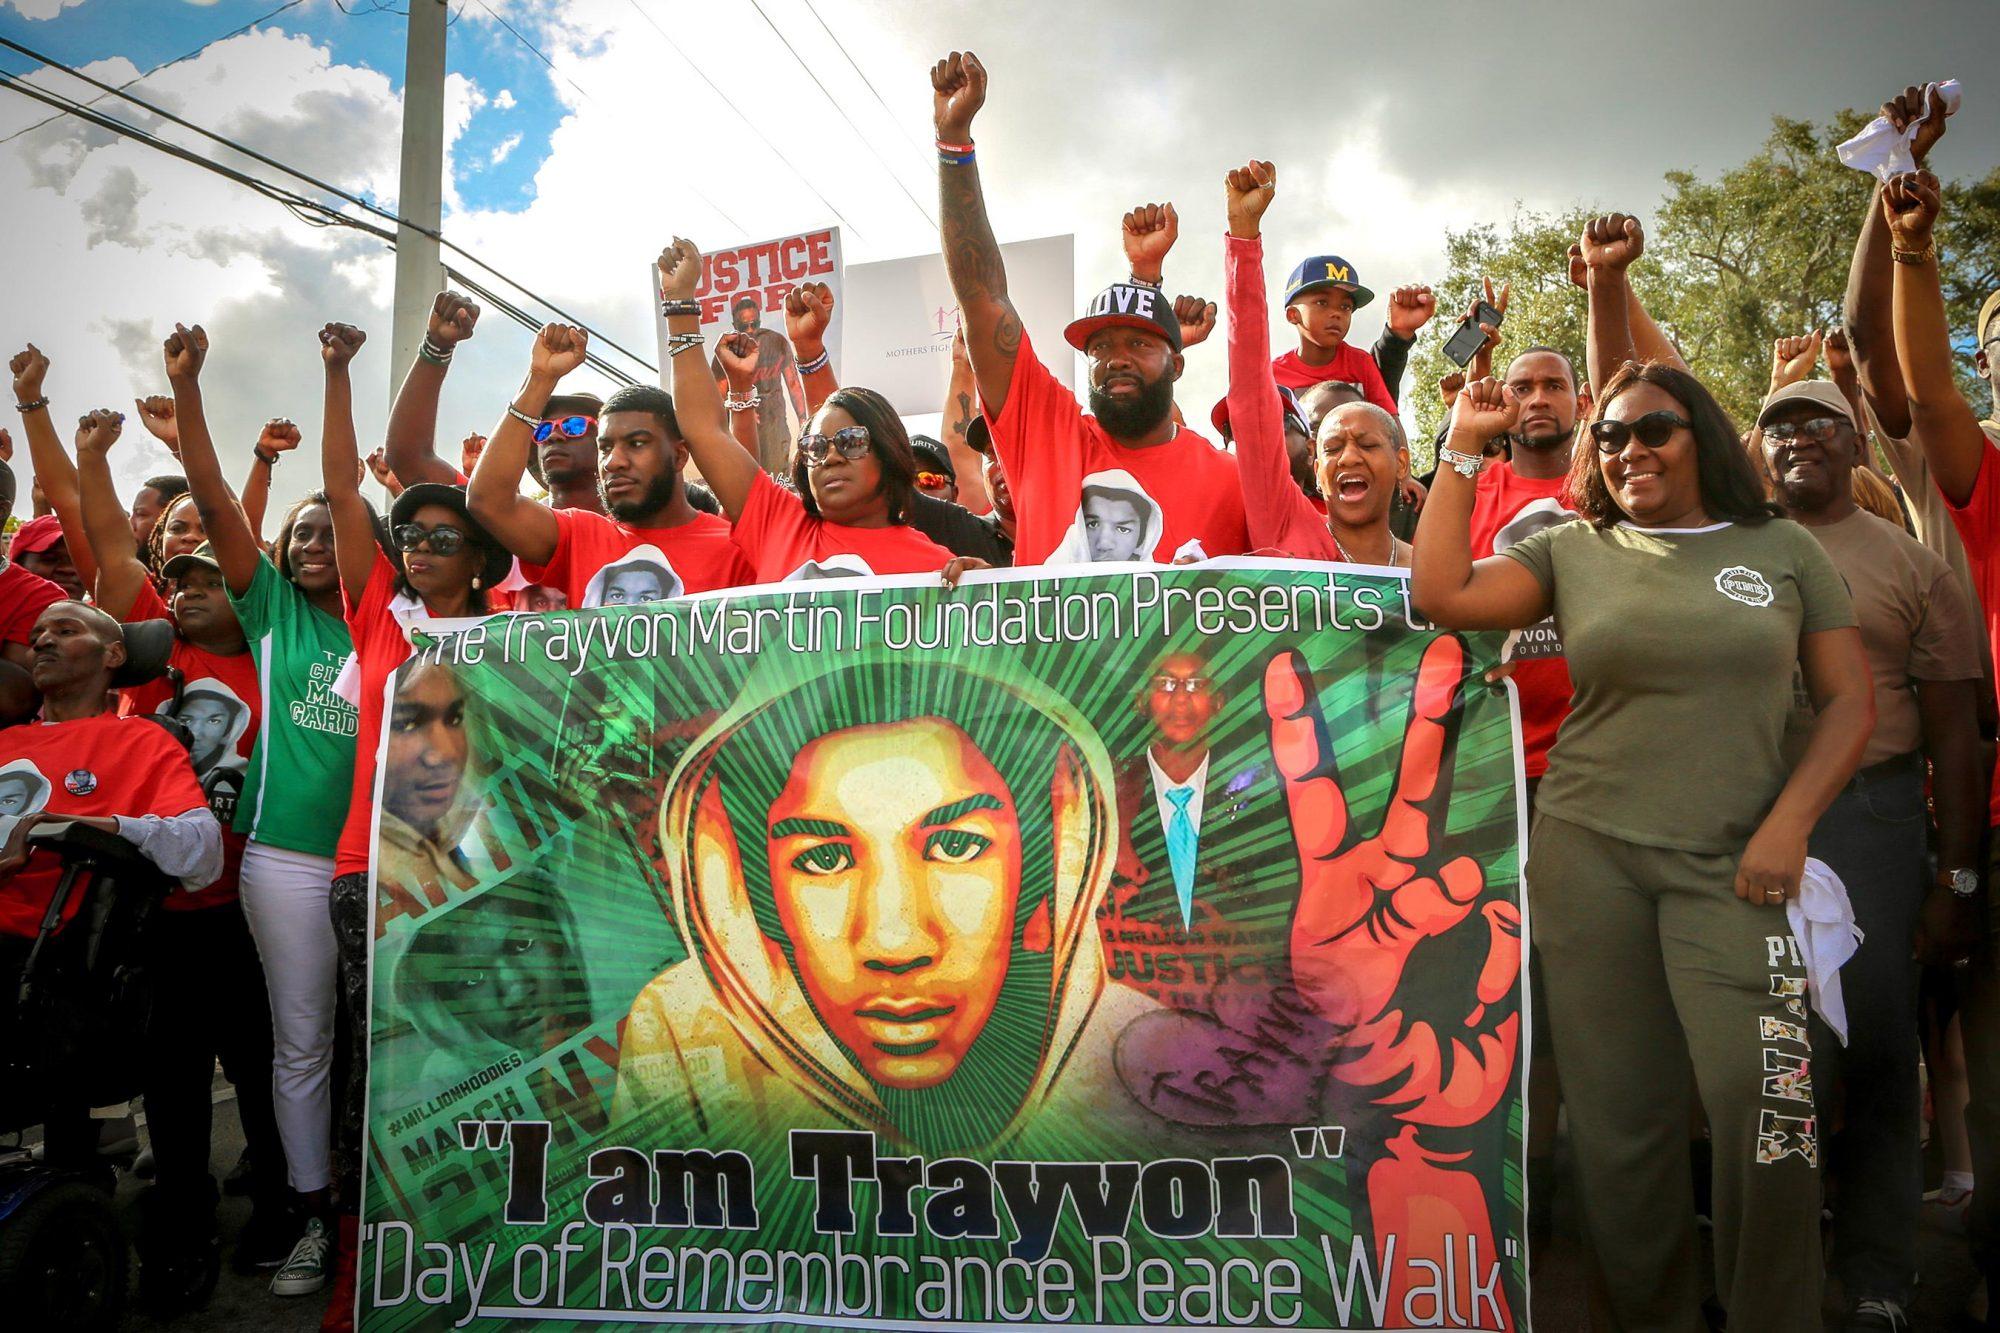 Rest-in-Power_The-Trayvon-Martin-Story_(Chachi-Senior)_1